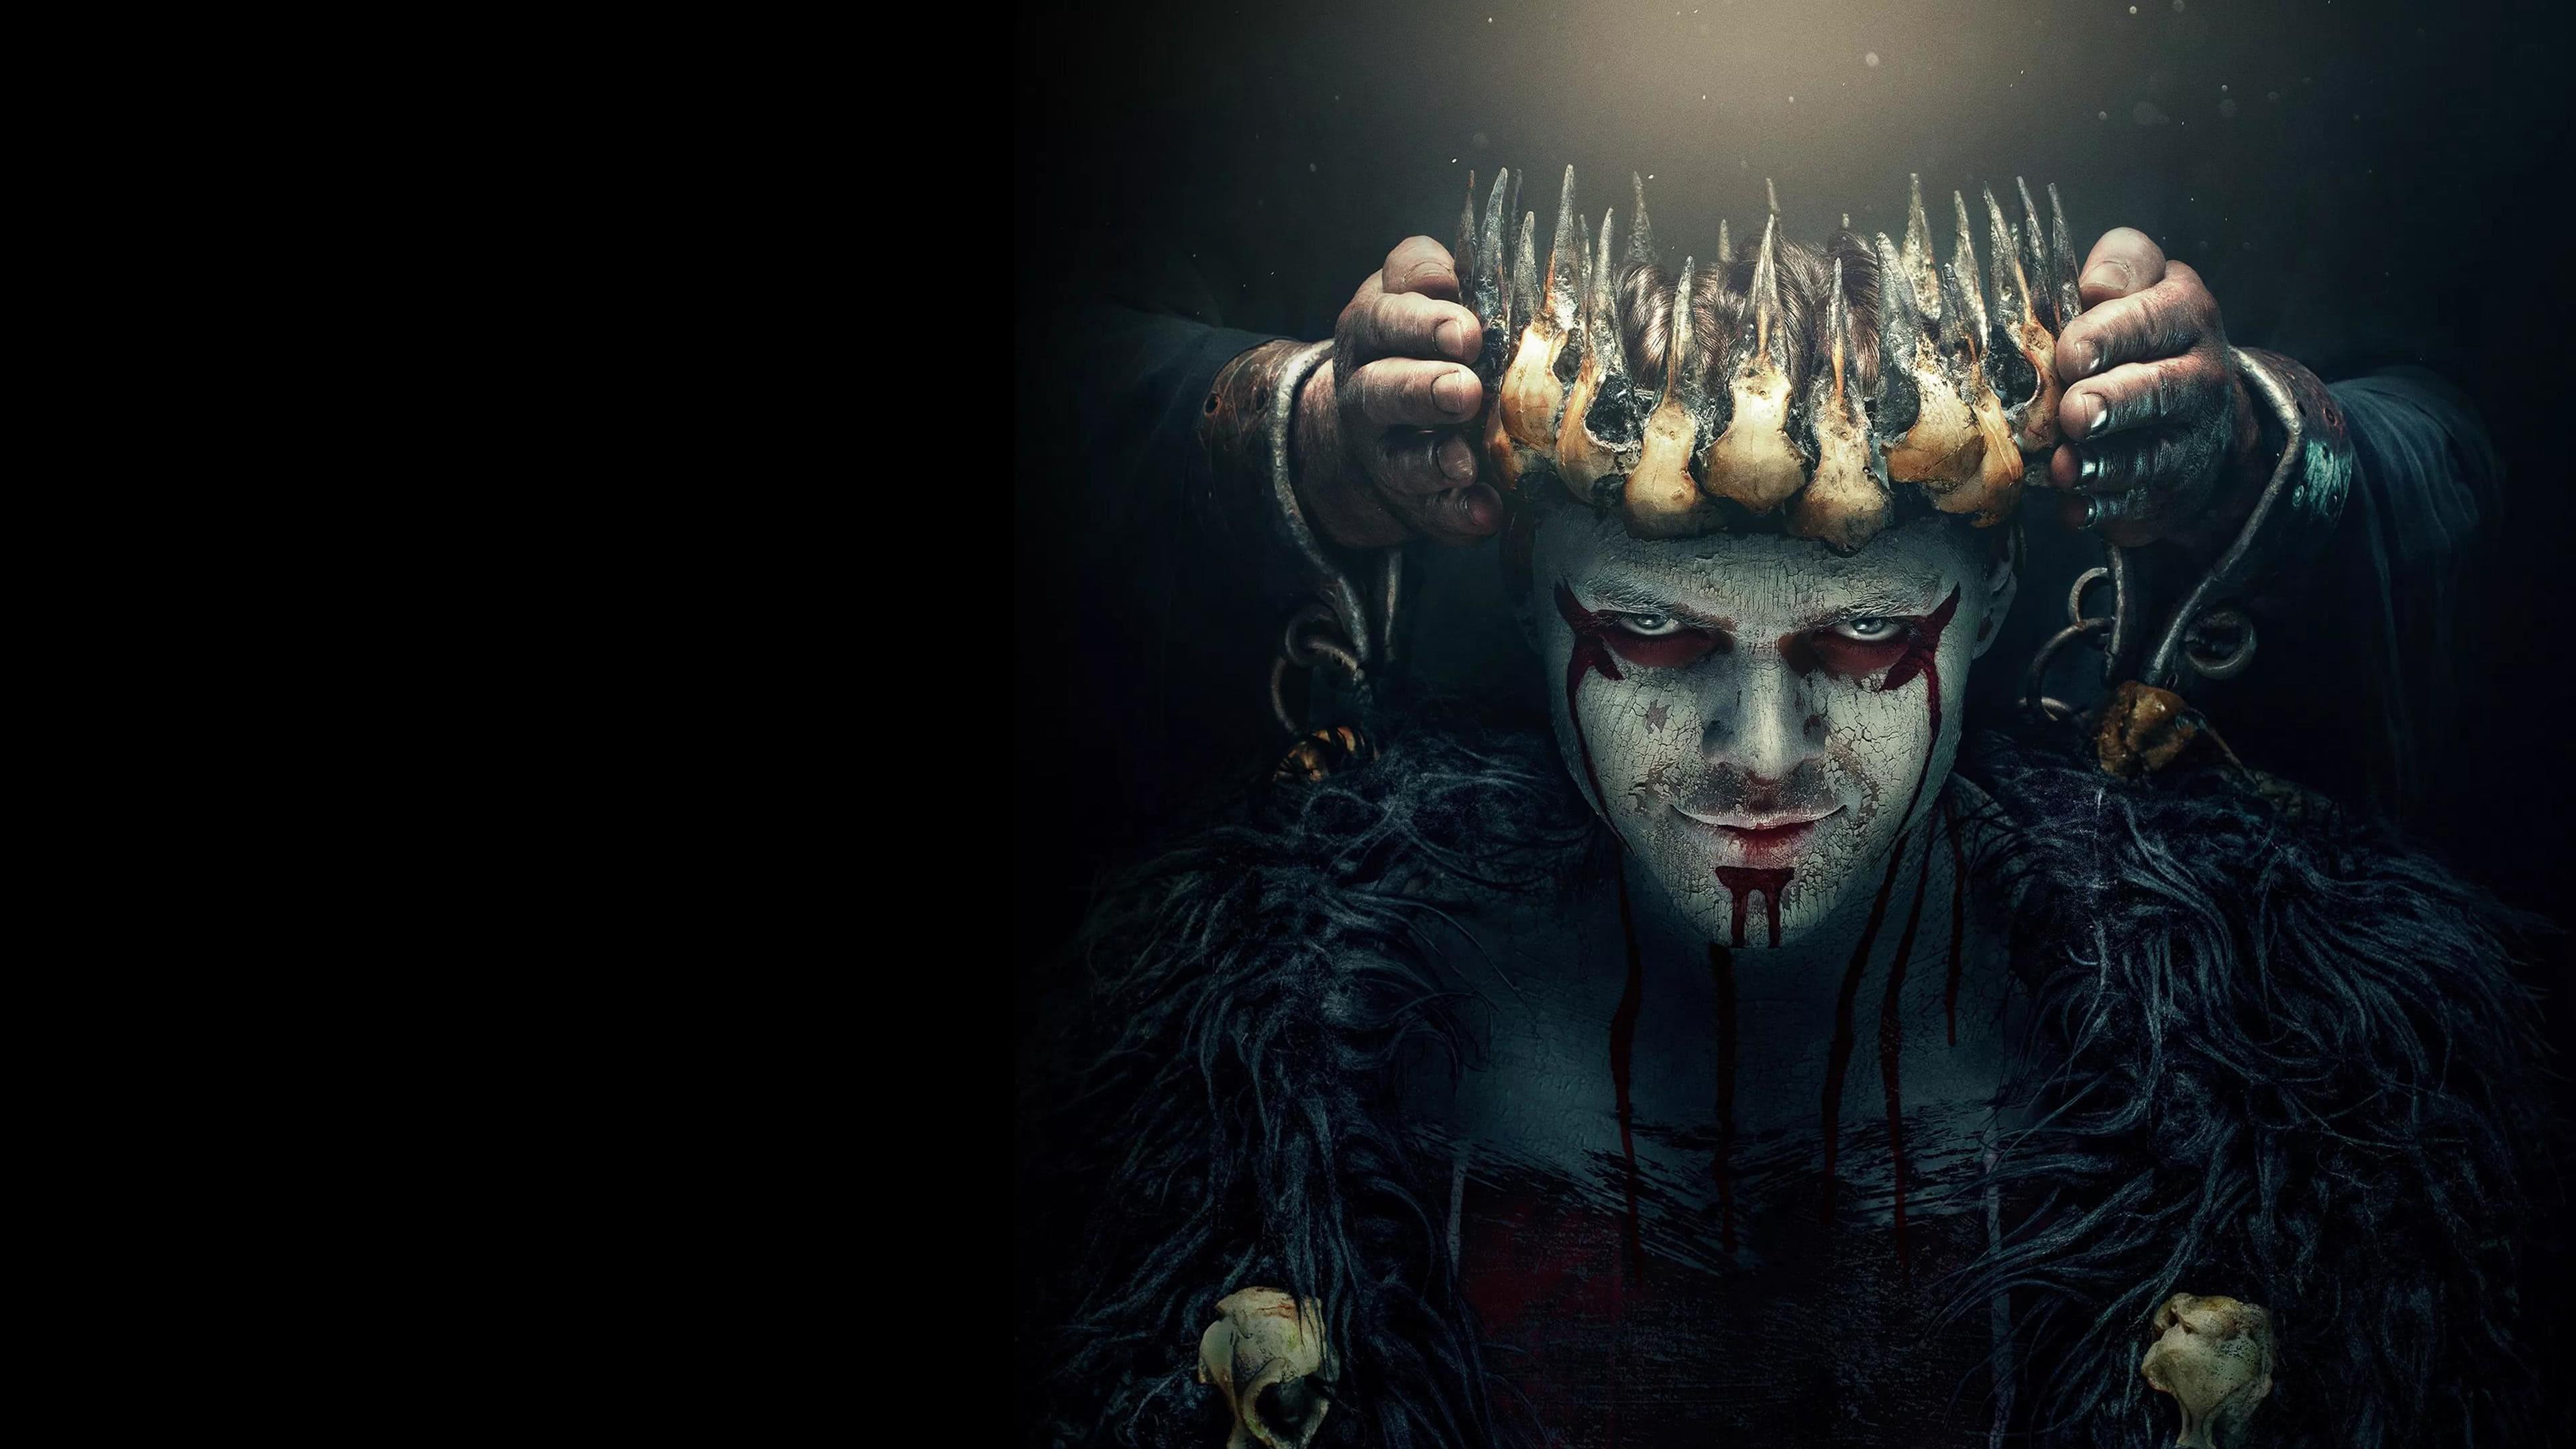 vikings ivar the boneless crown uhd 4k wallpaper